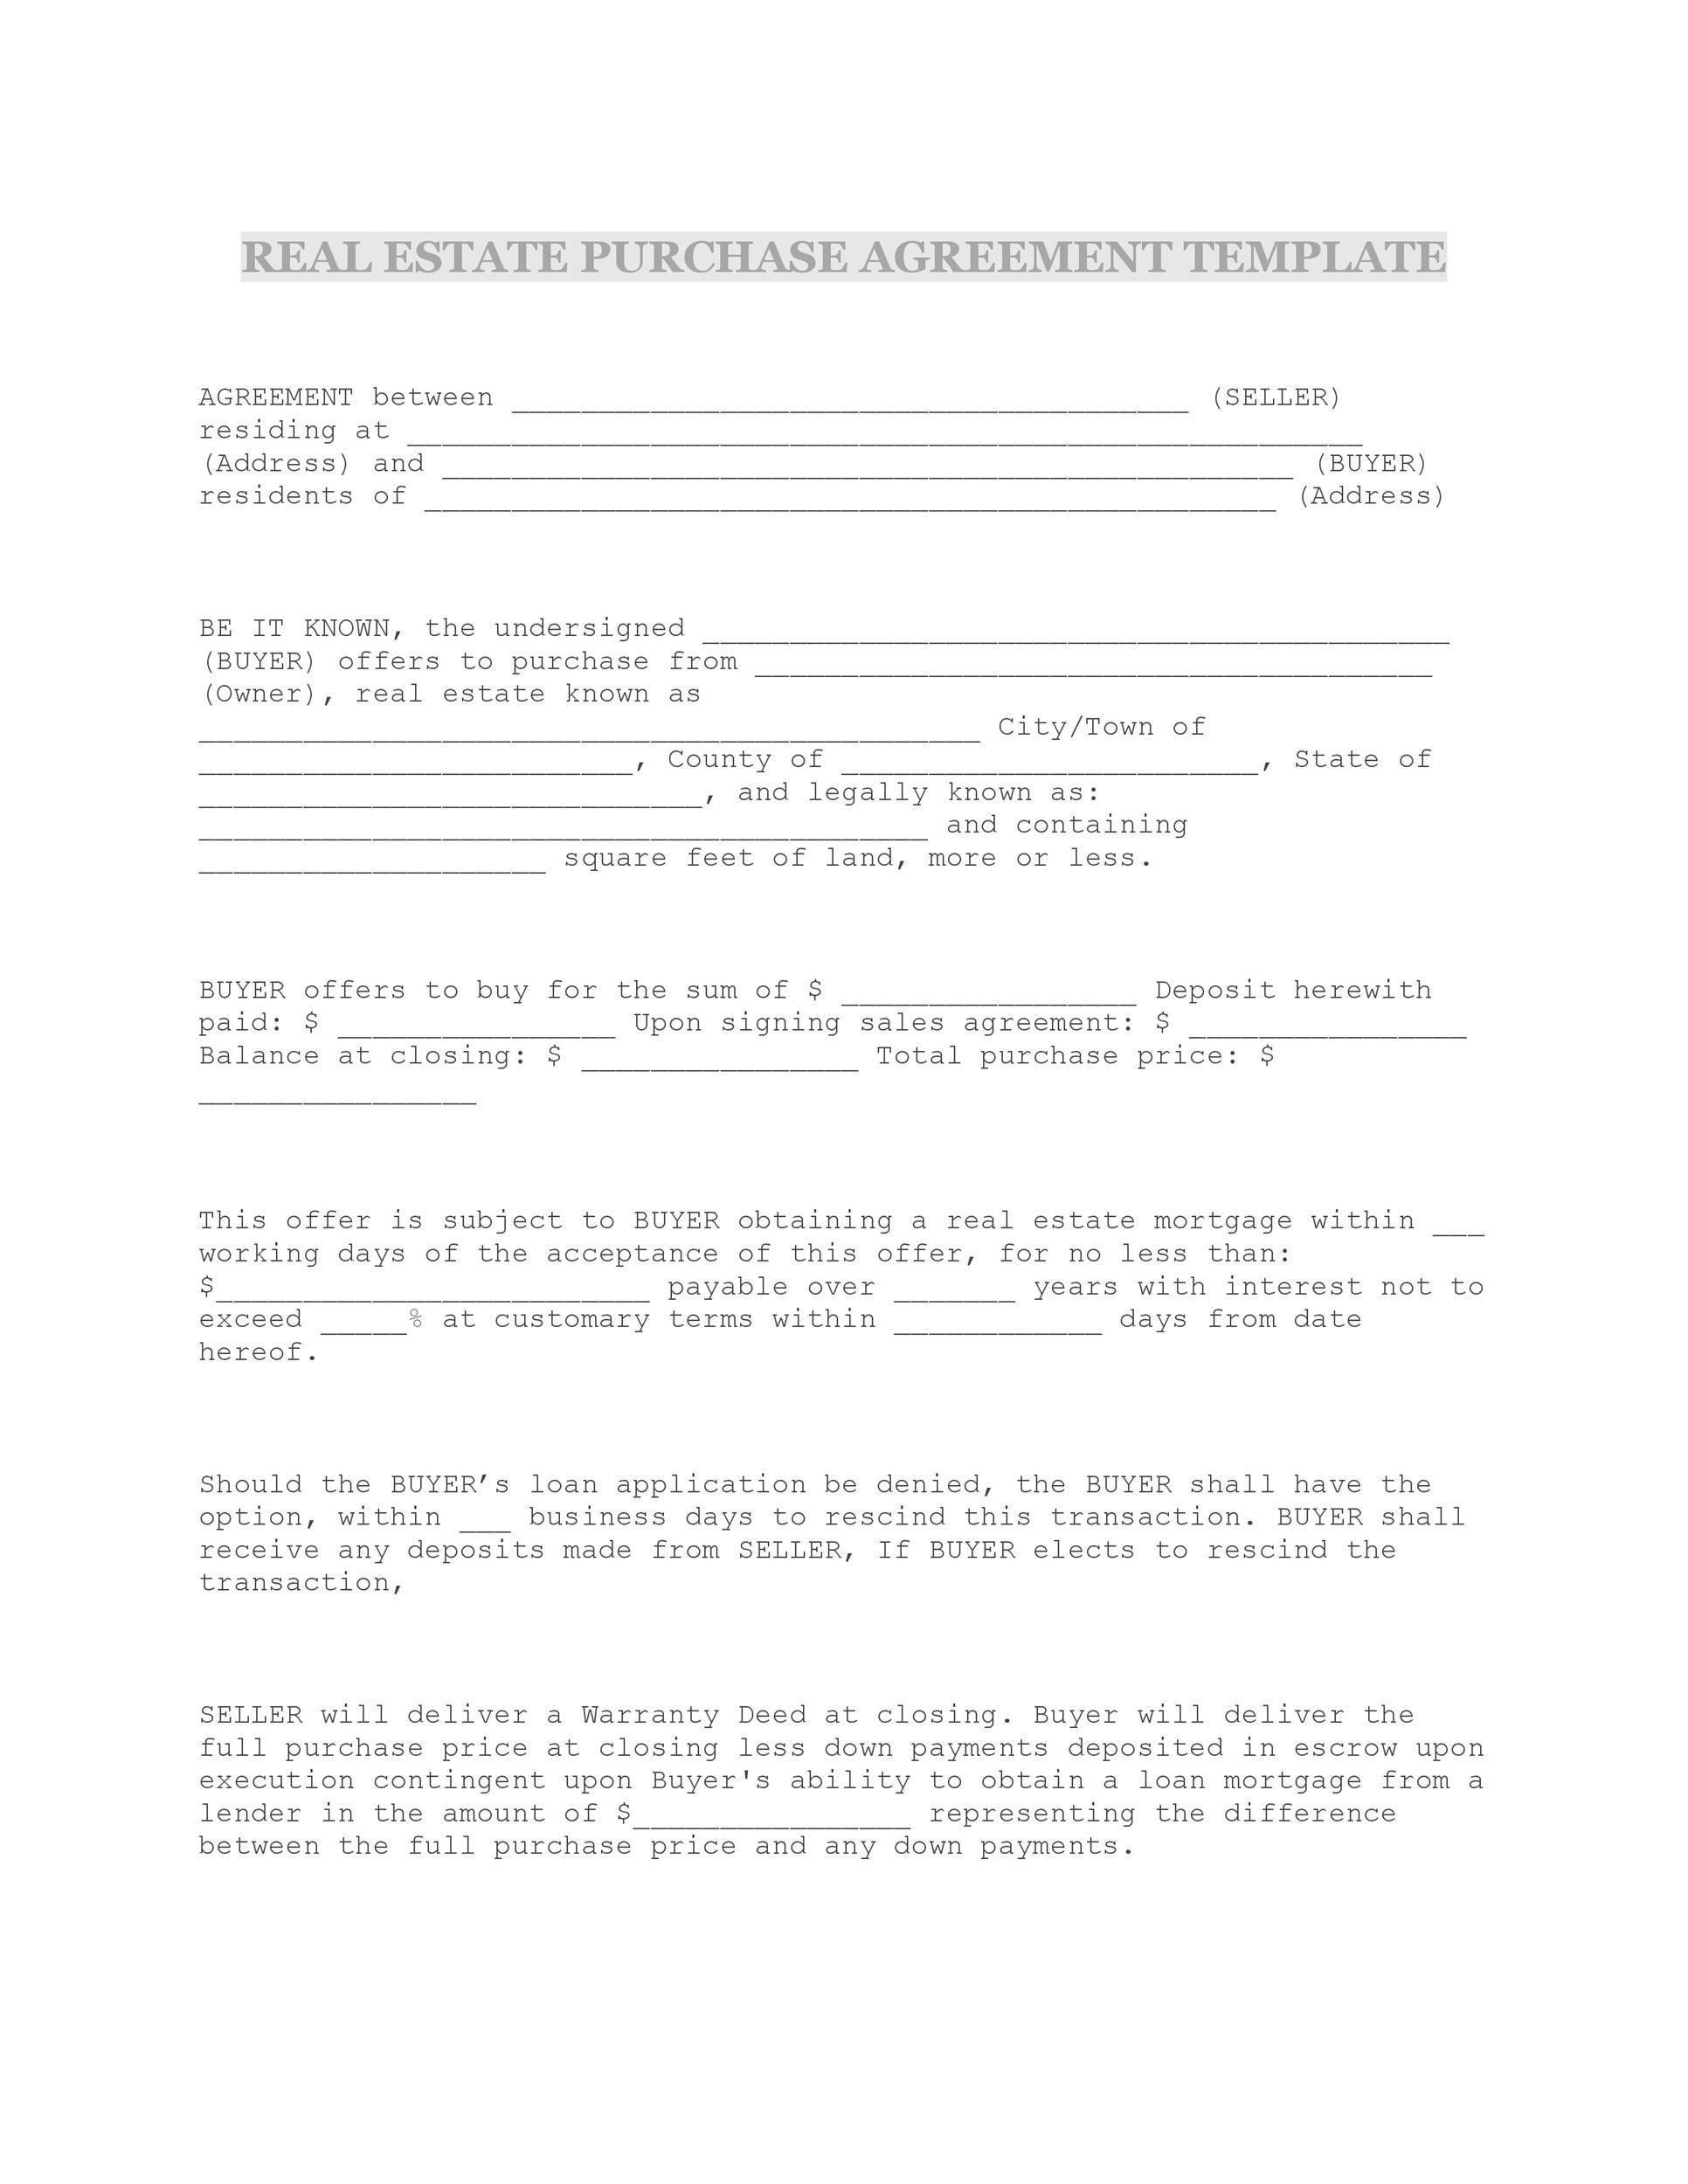 008 Imposing Real Estate Purchase Agreement Template Photo  Contract California Minnesota British ColumbiaFull